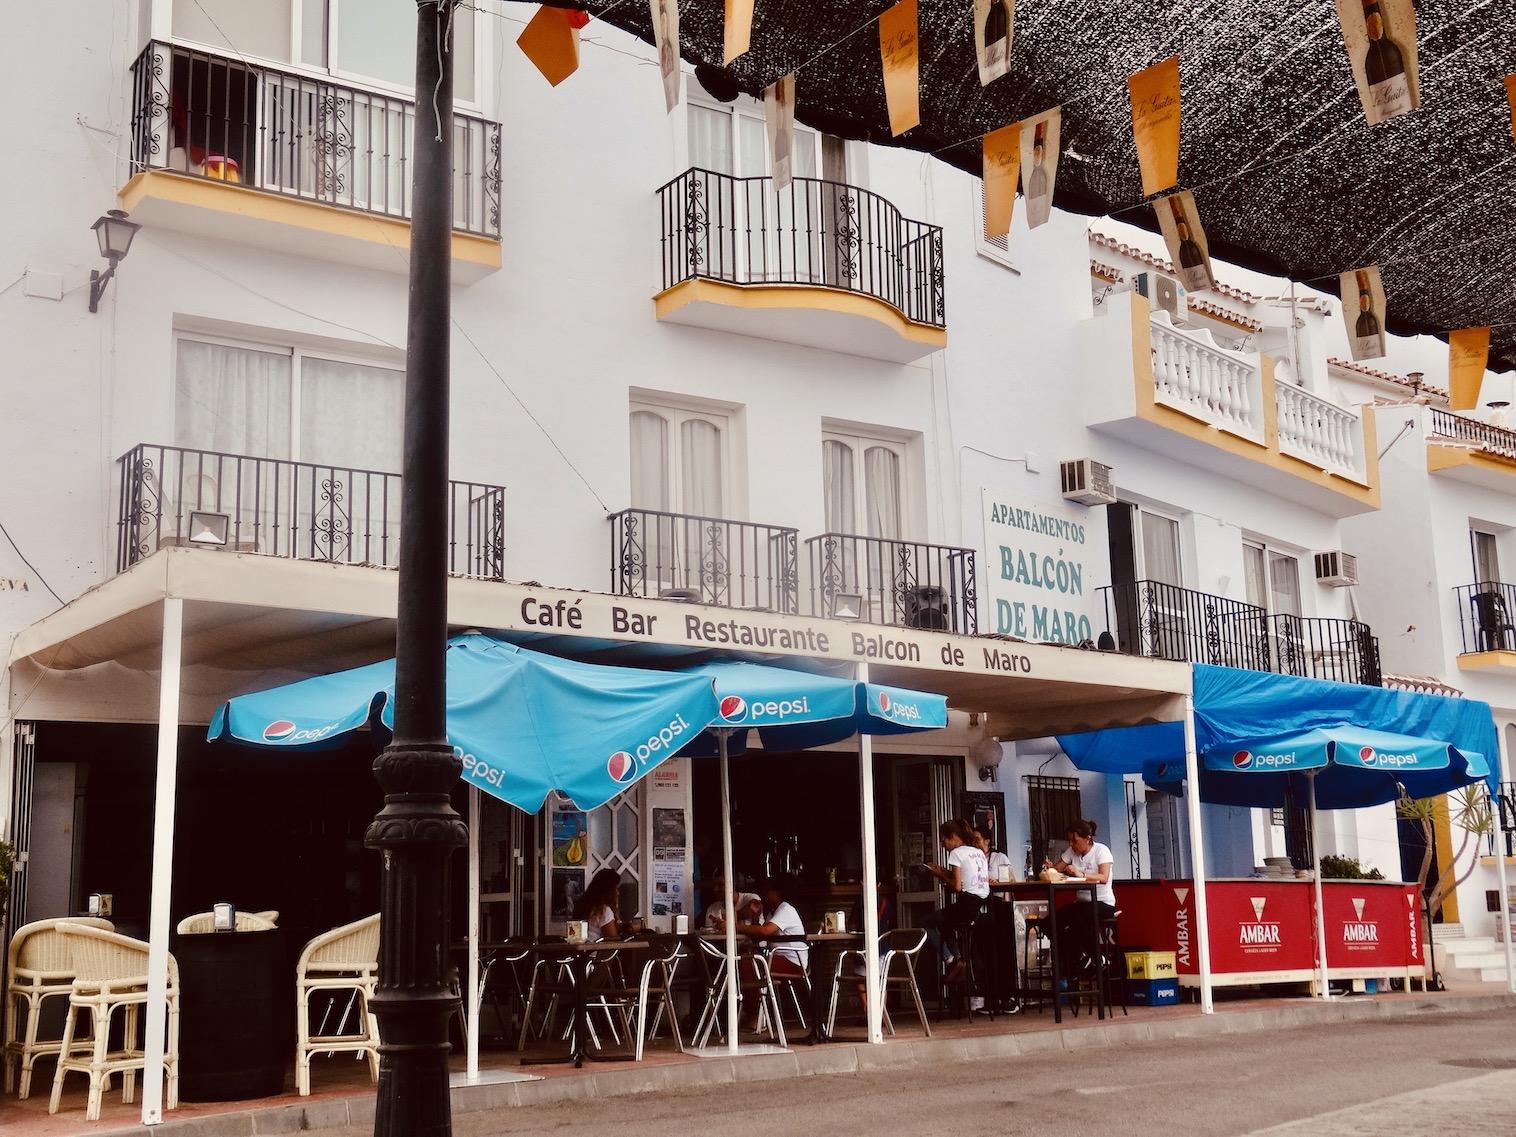 Balcon de Maro Restaurant.